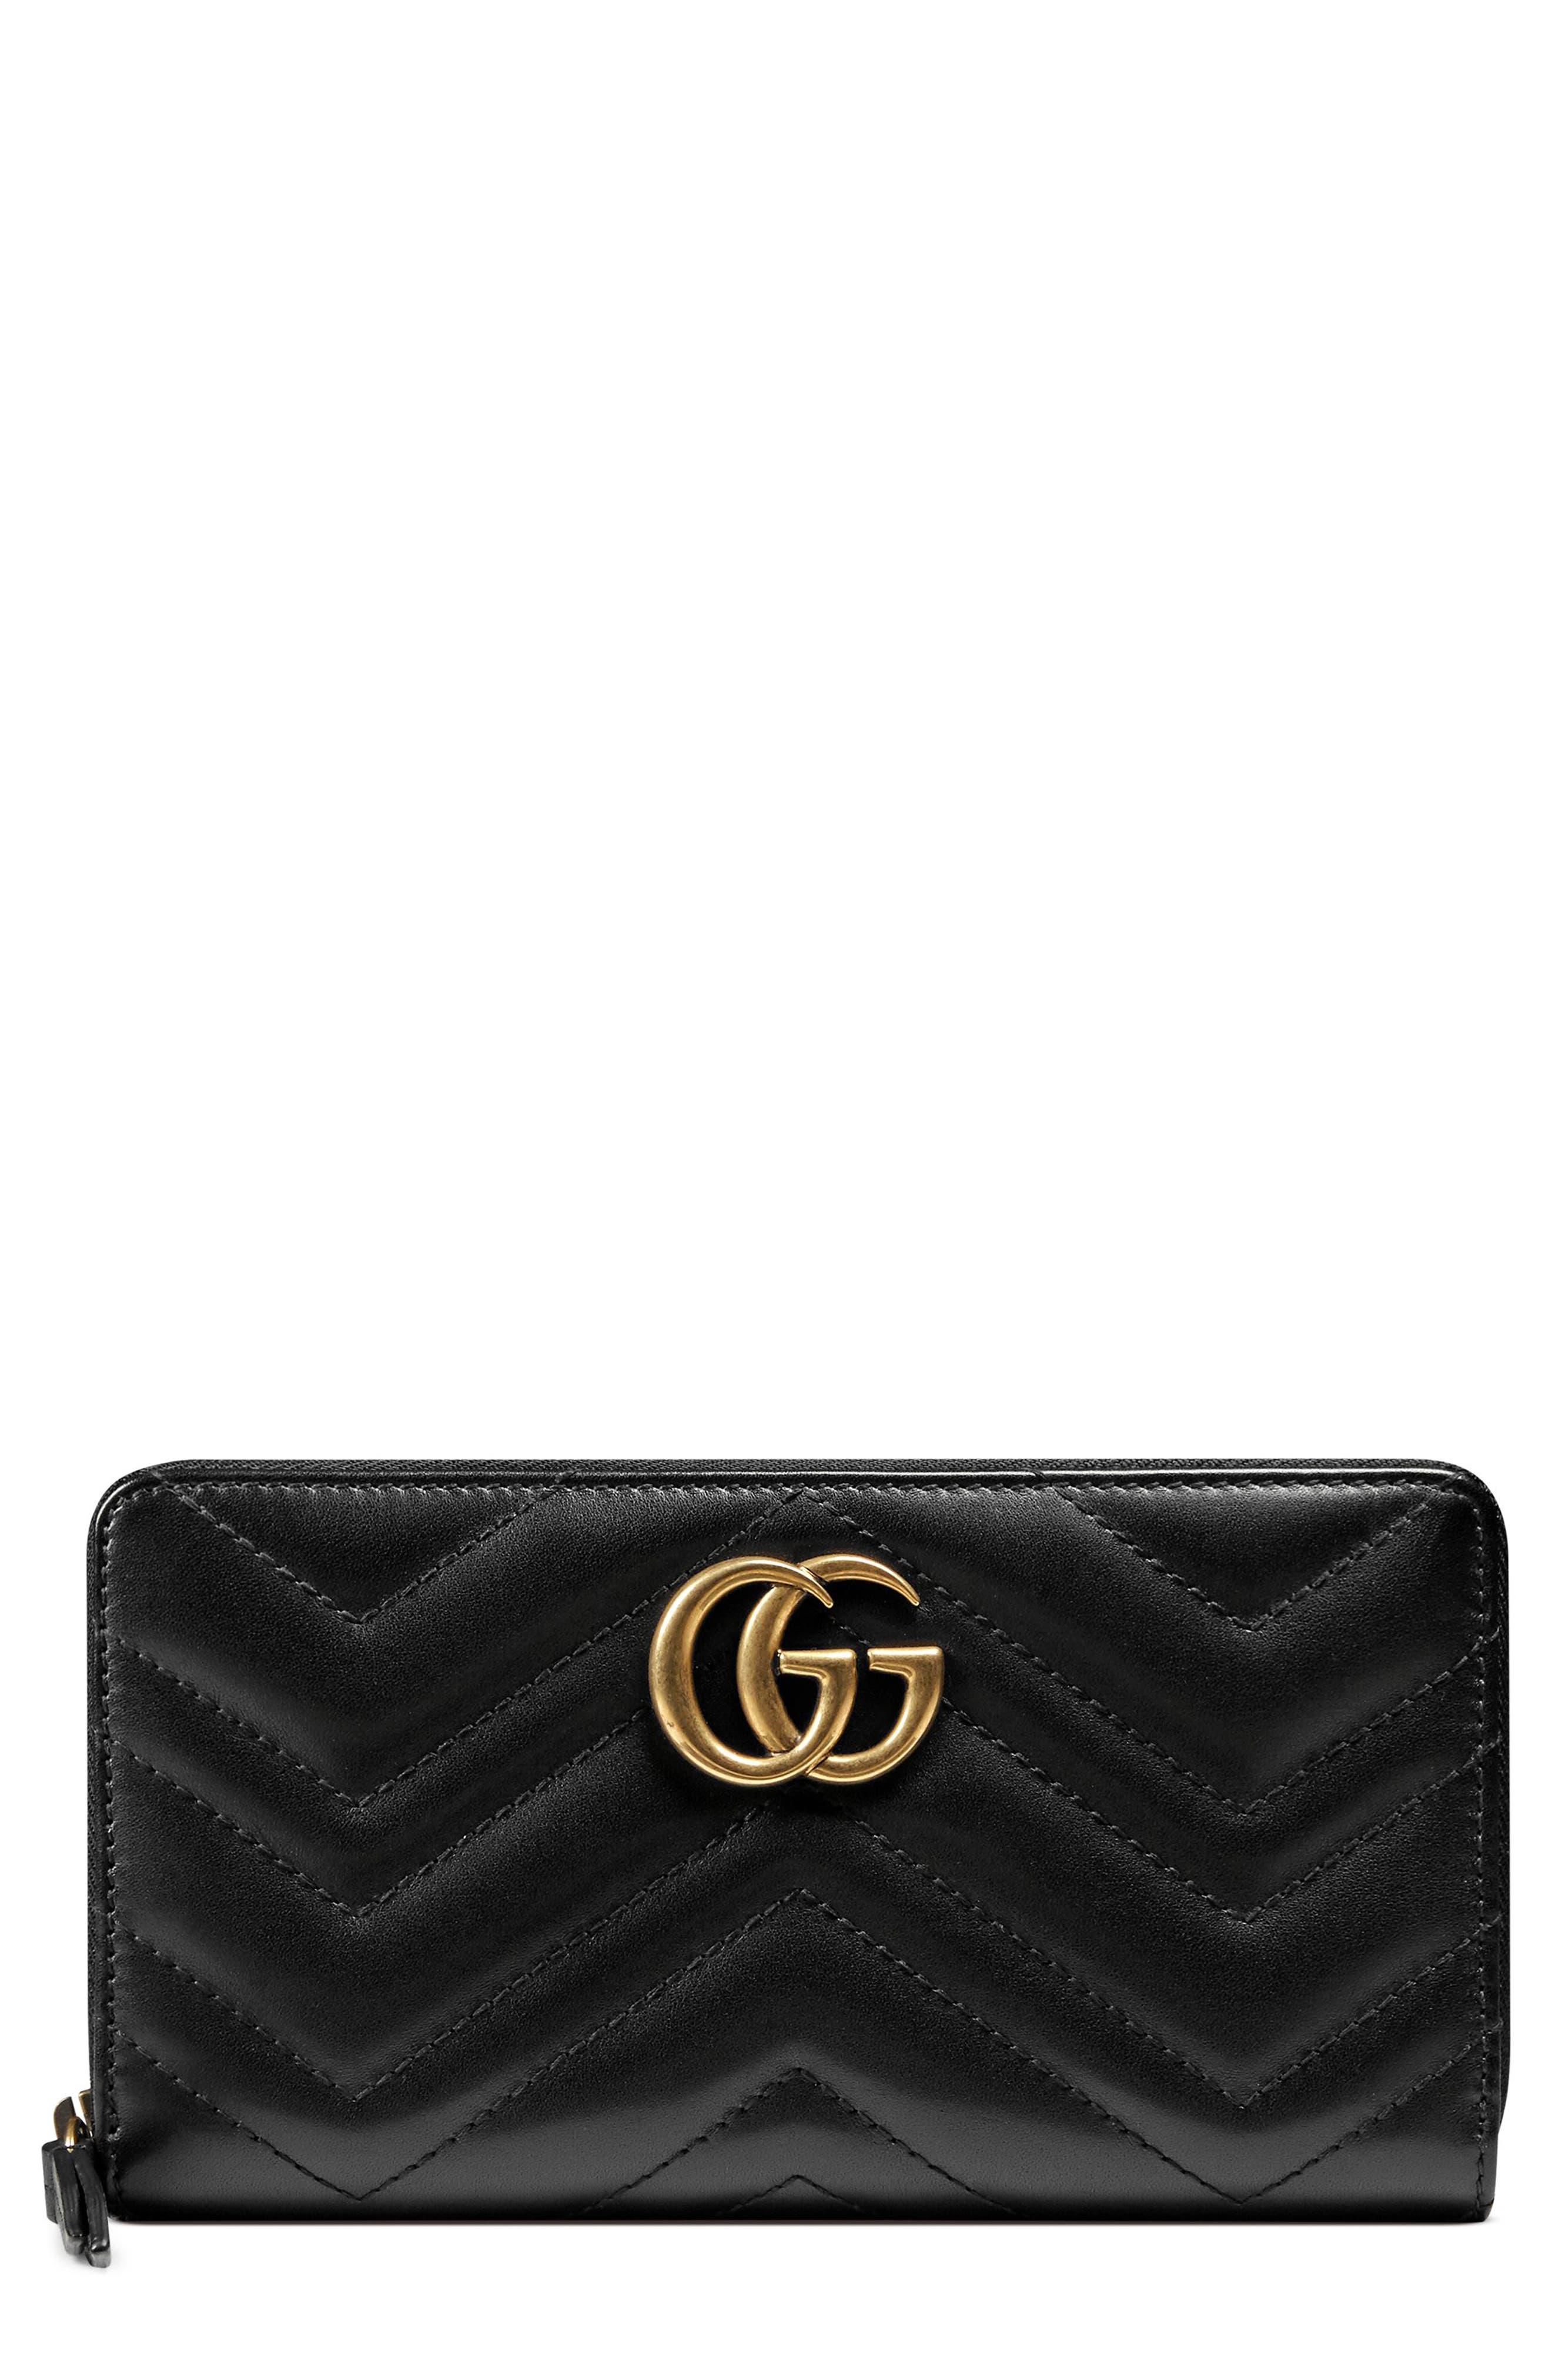 GUCCI GG Marmont Matelassé Leather Zip-Around Wallet, Main, color, NERO